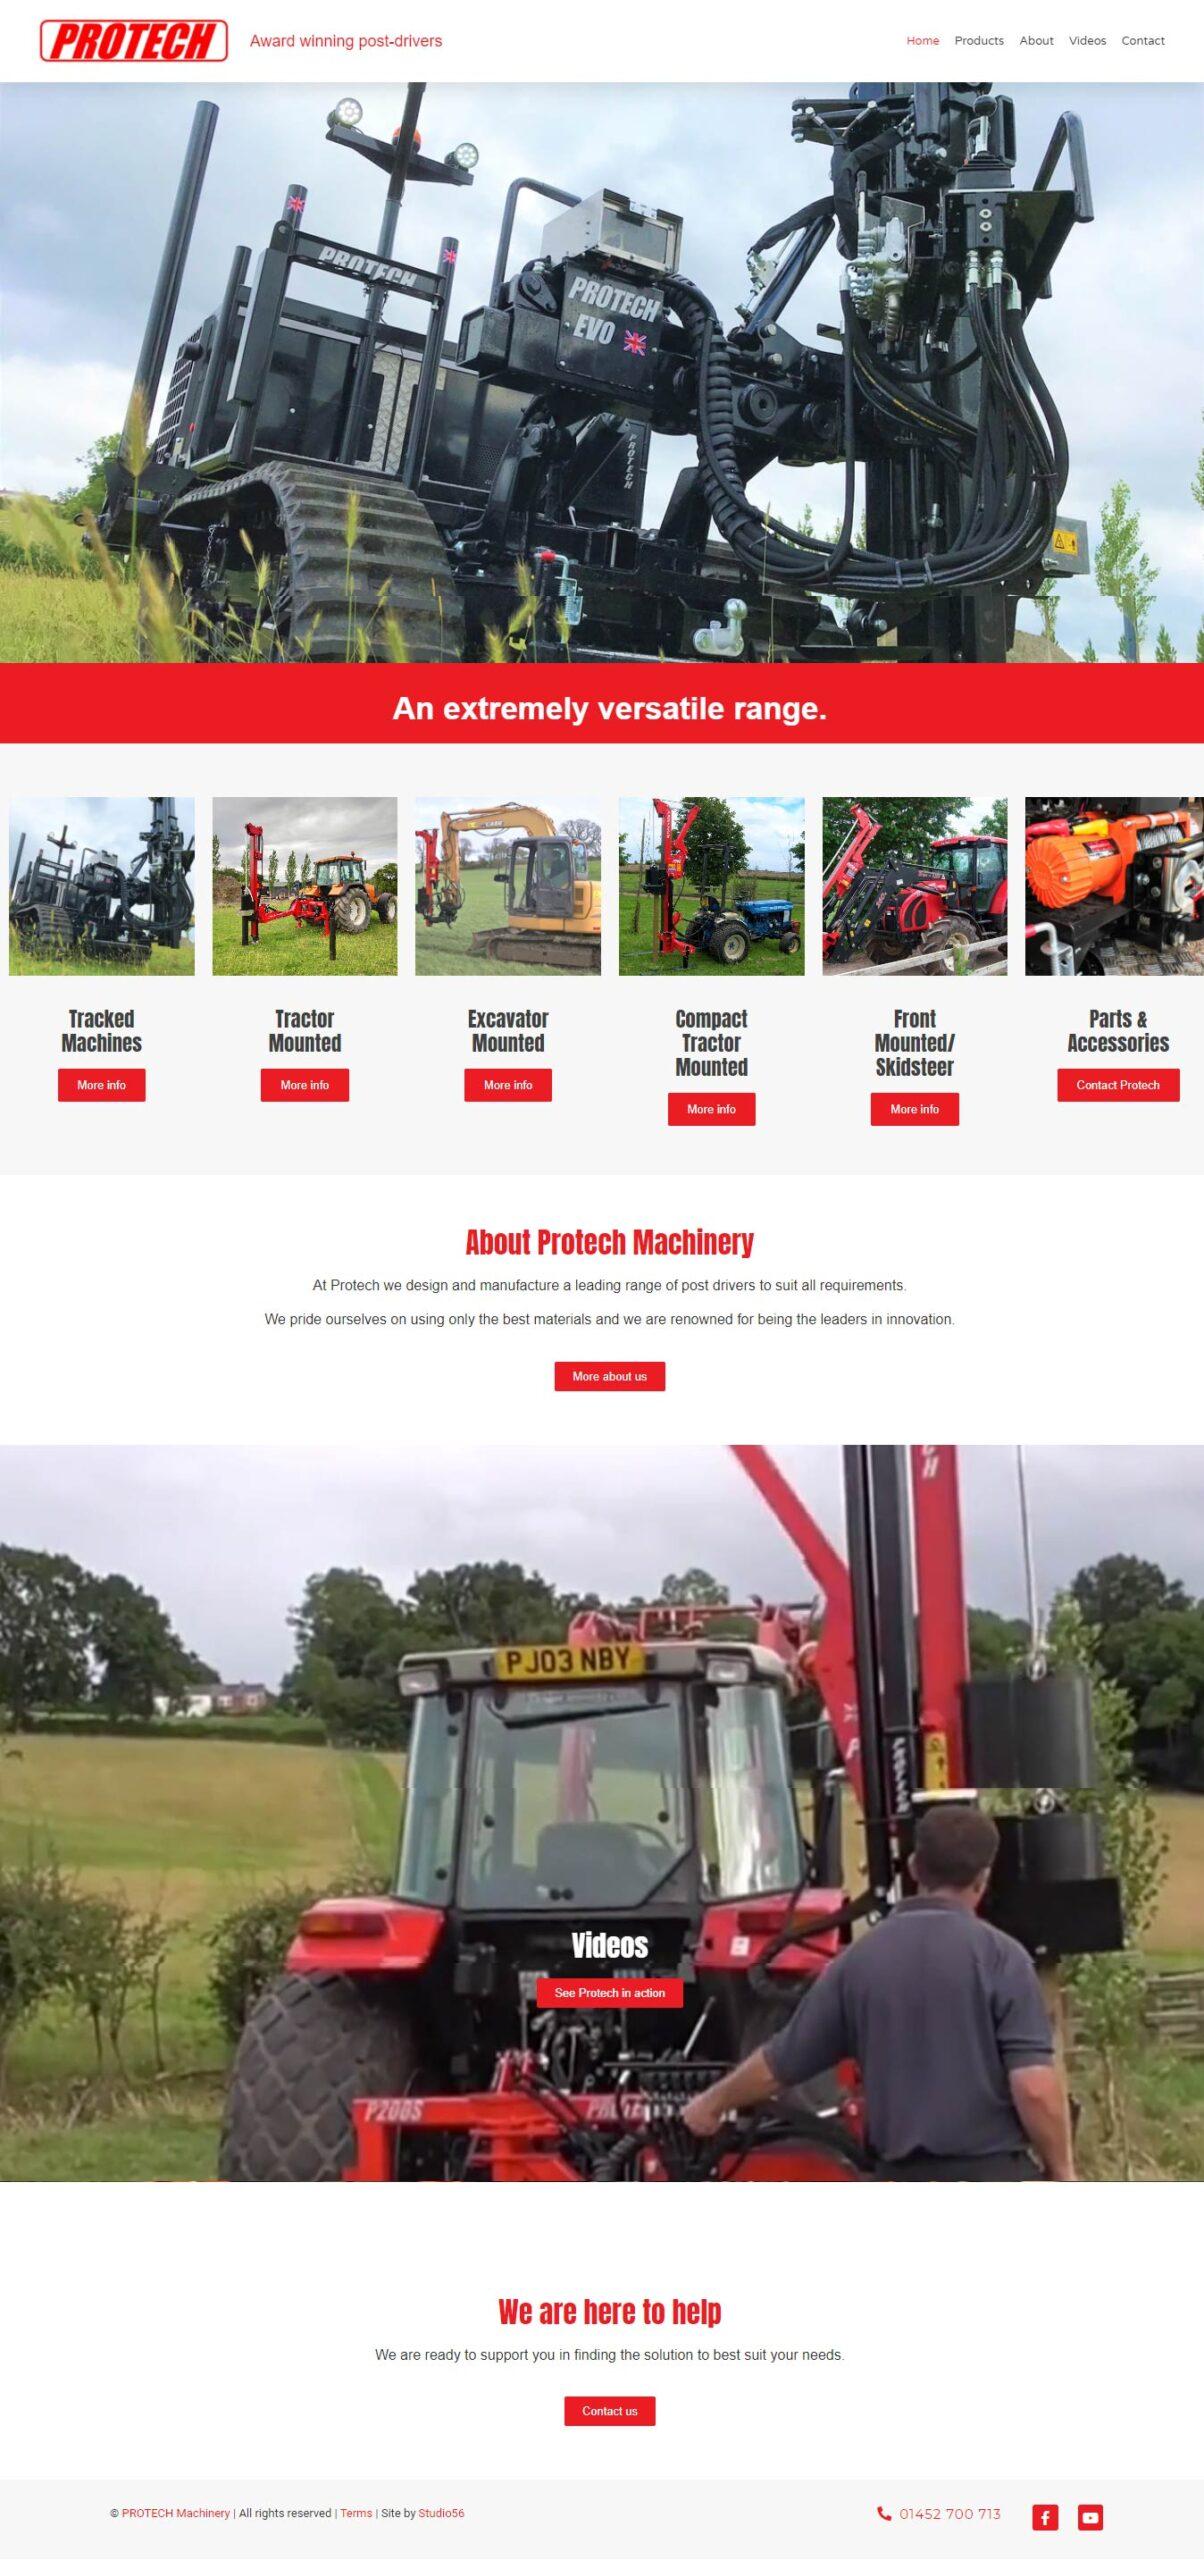 Protech Machinery New Website Design